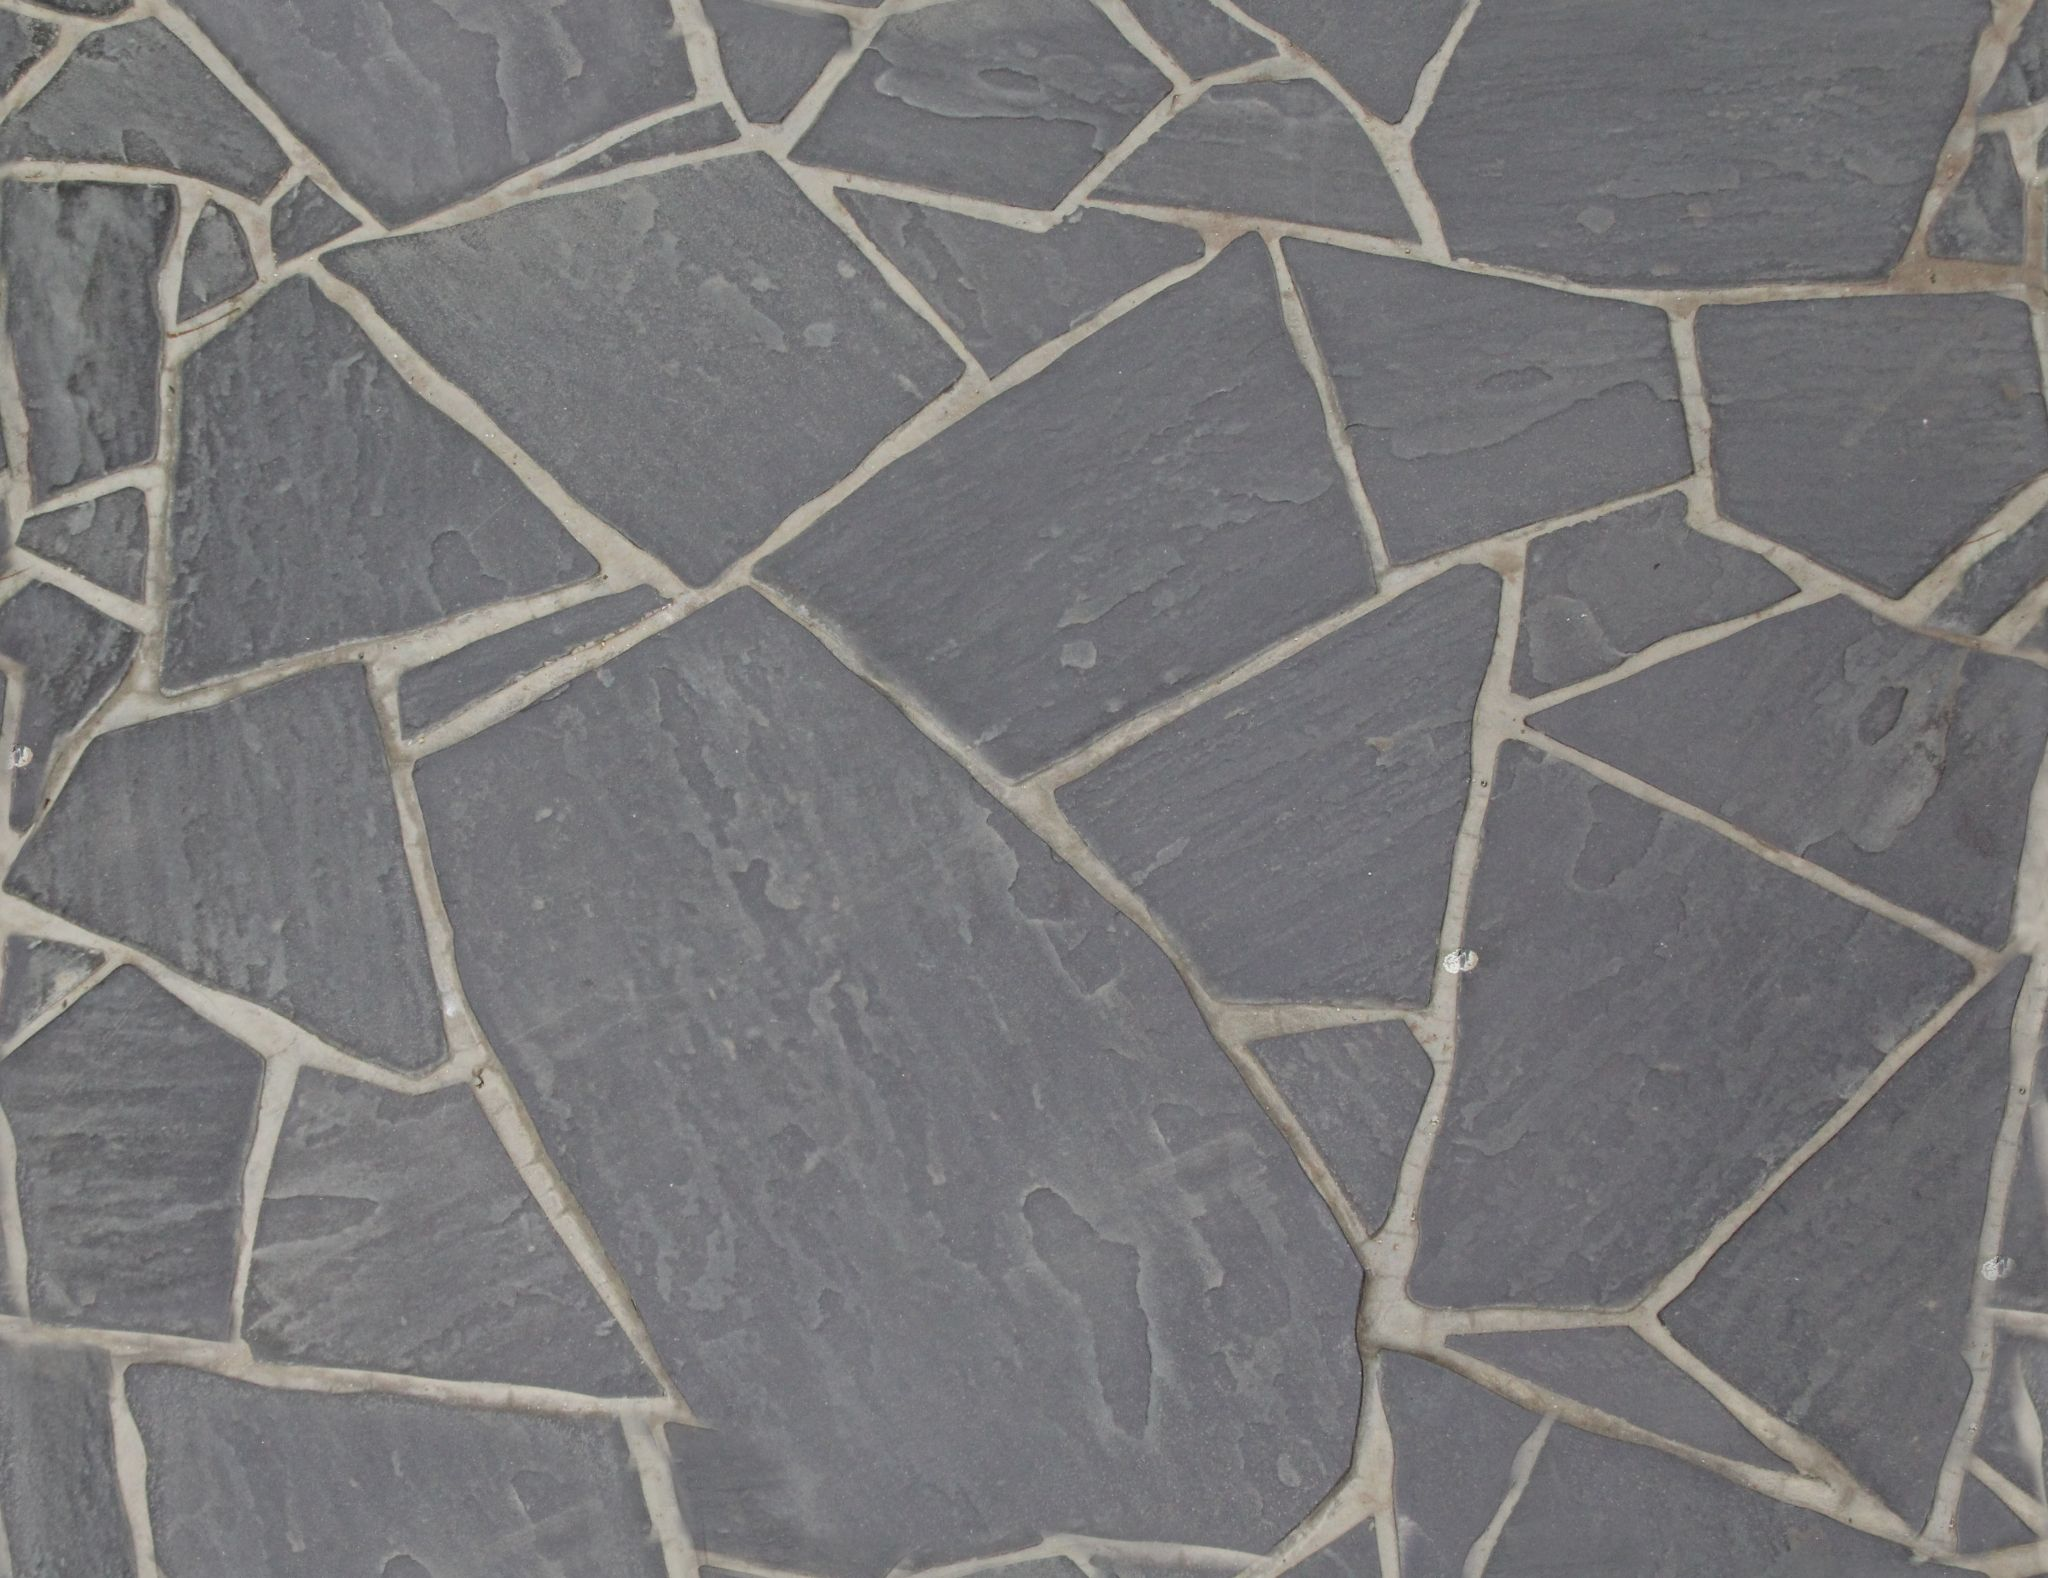 Pavement texture photo